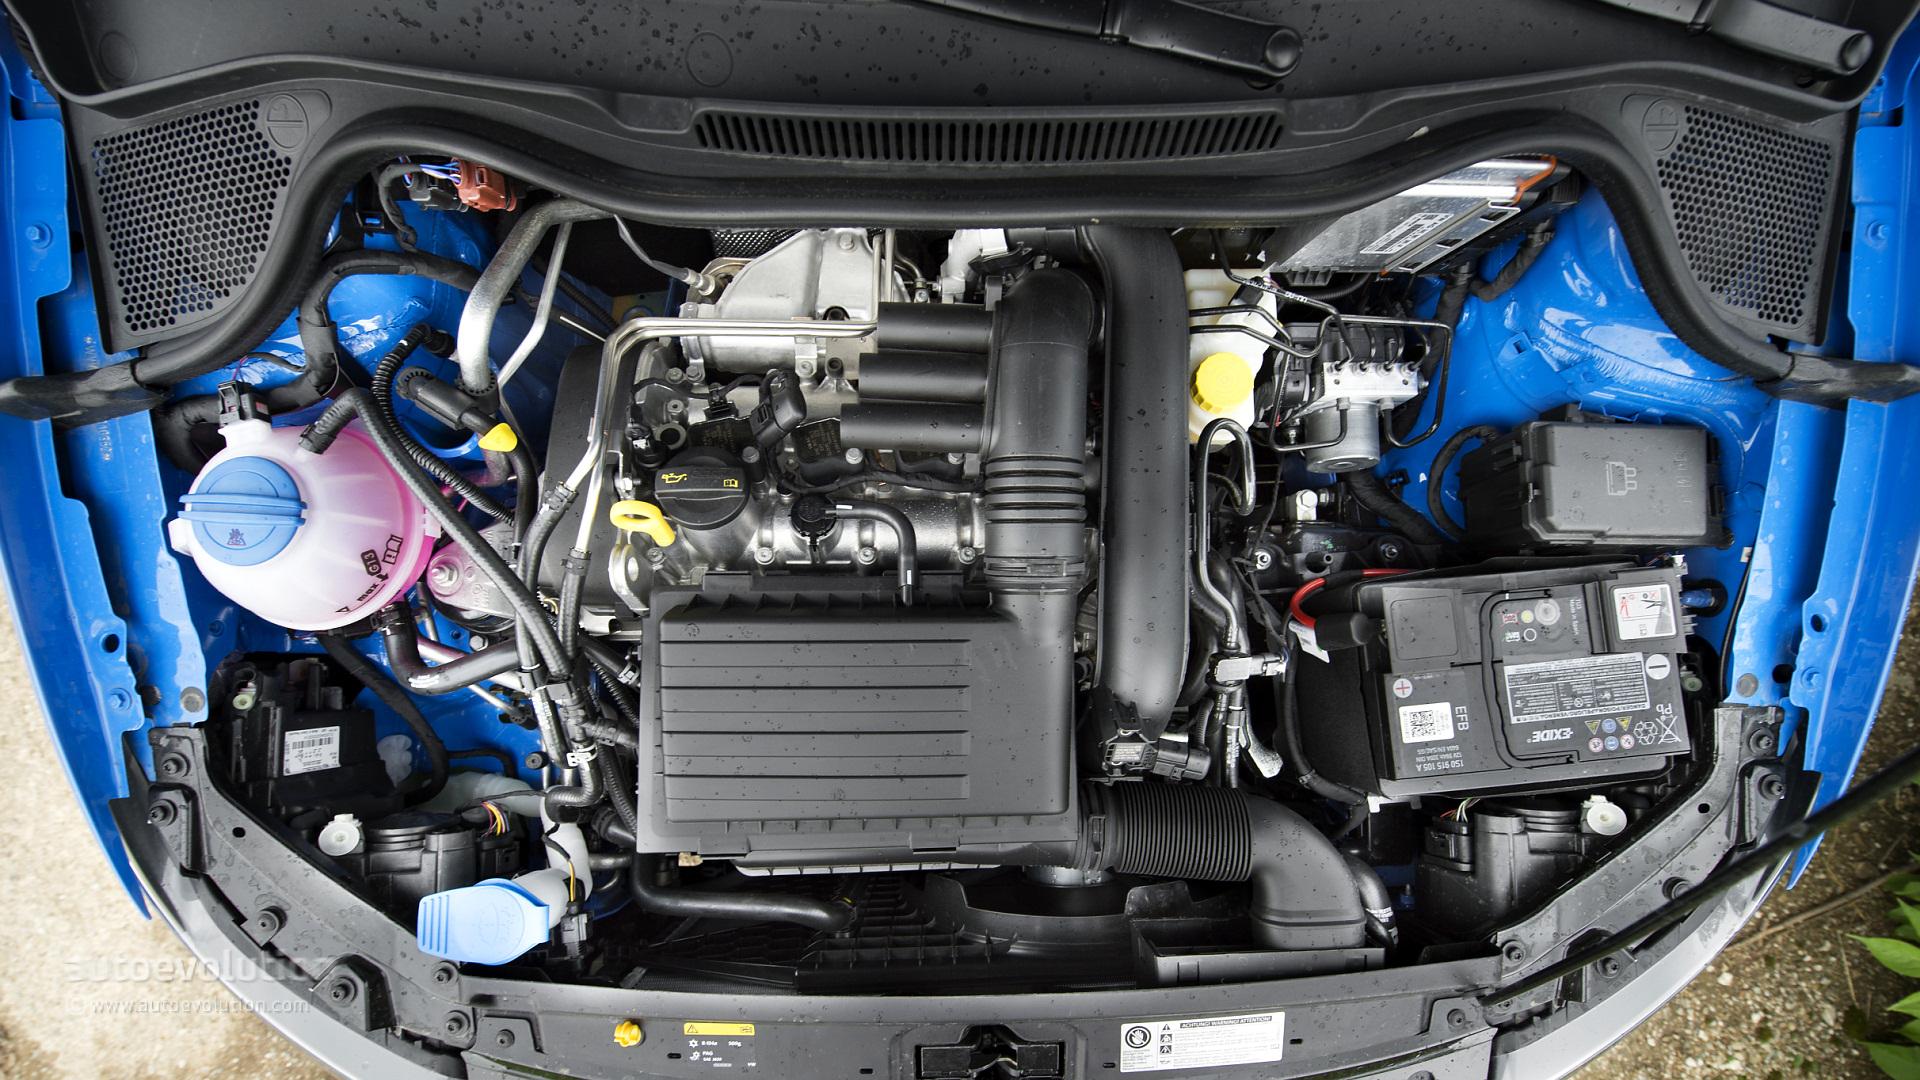 2014 Volkswagen Polo 1.2 TSI First Drive - autoevolution